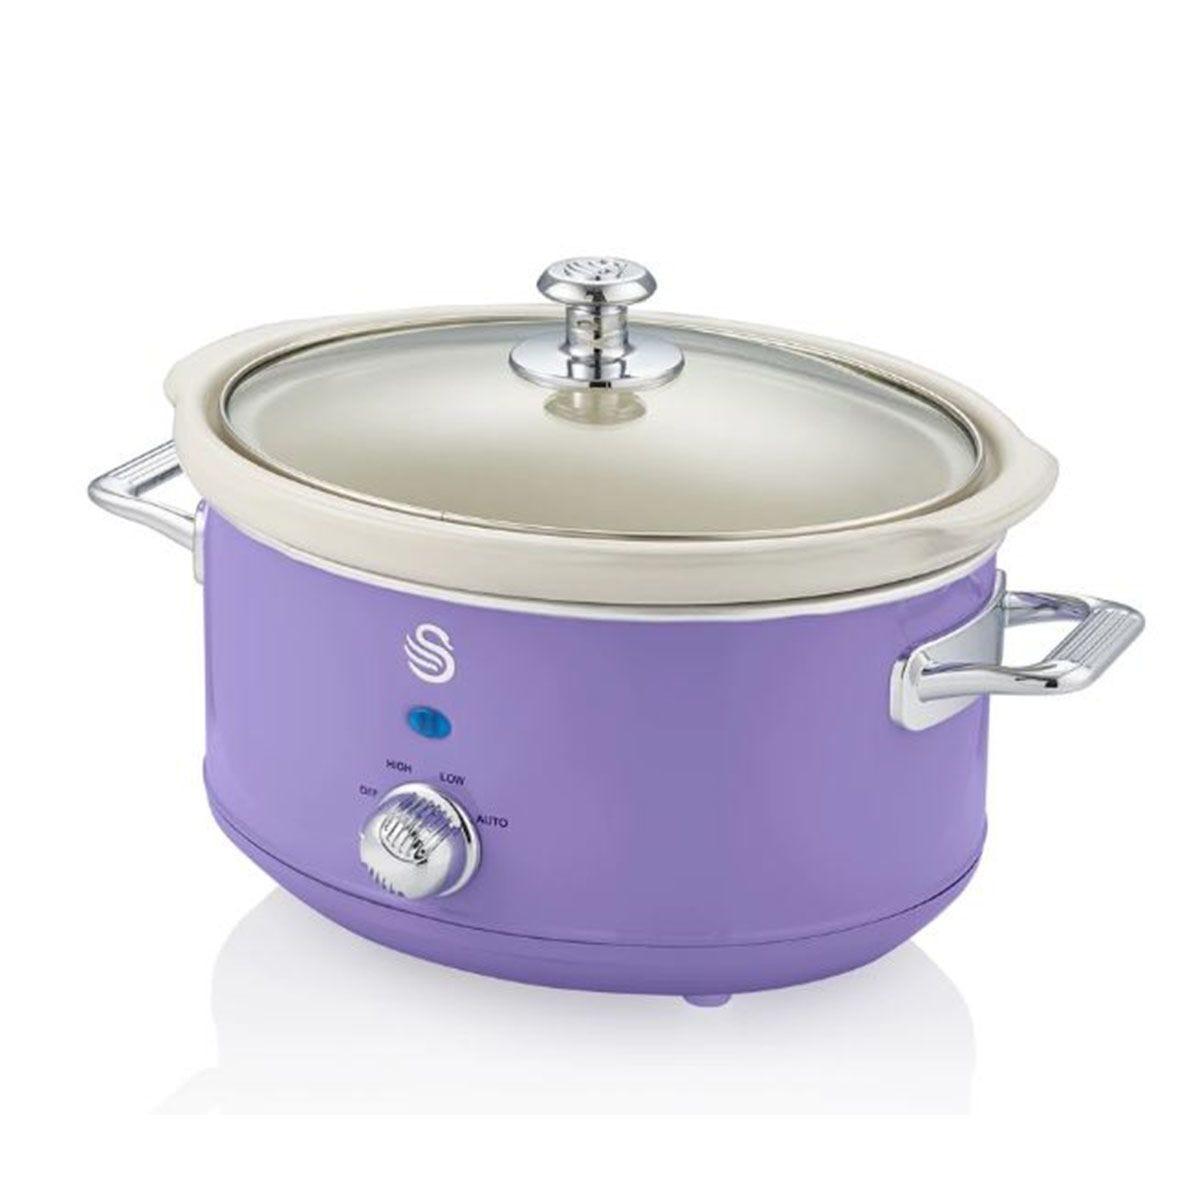 Swan SF17021PURN 3.5L Slow Cooker Retro - Purple